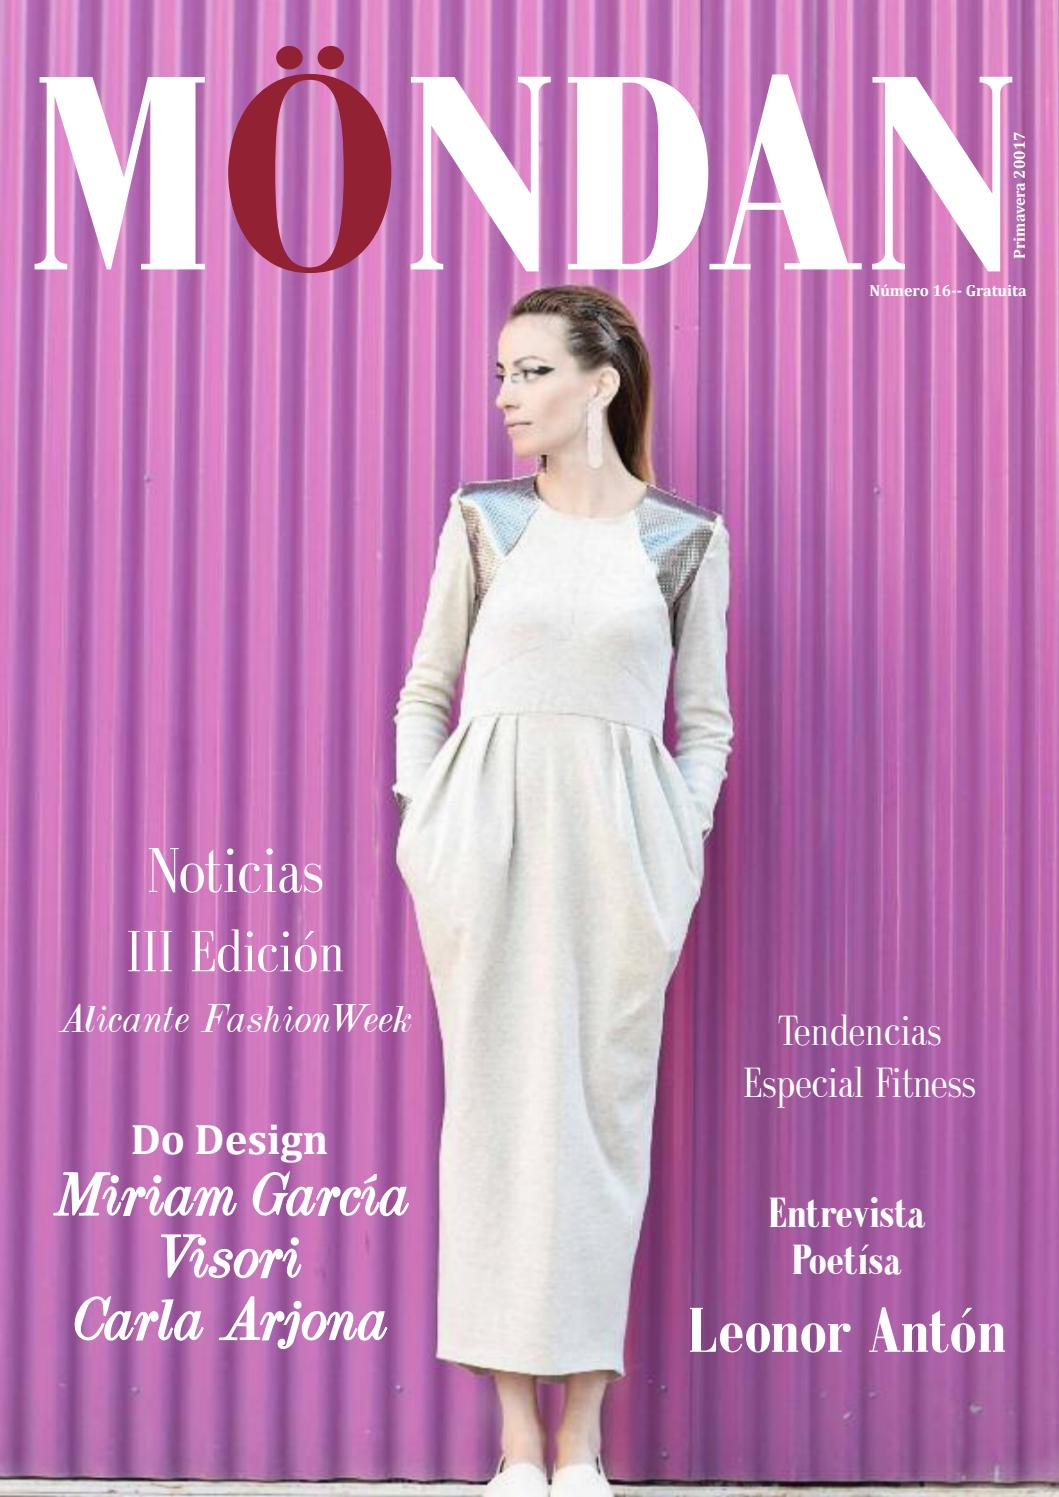 Mondan 16 primavera 2017 by Möndan Moda - issuu